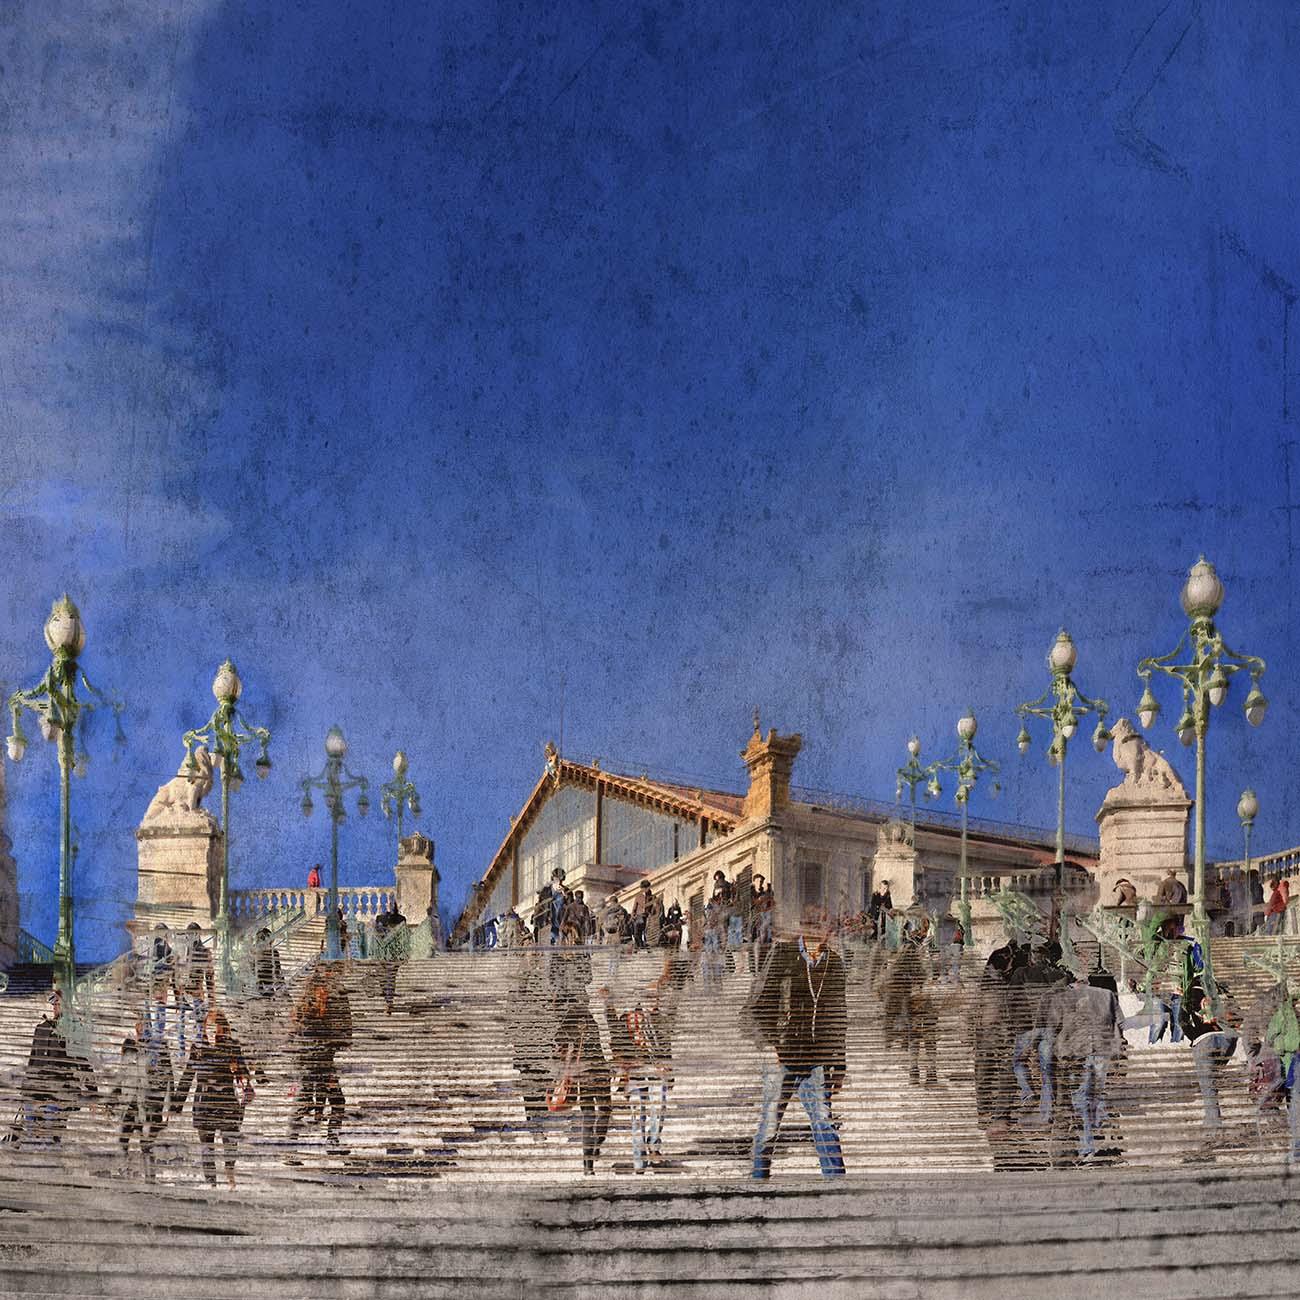 Gare Saint-Charles Bleu Marseille Paul-Louis LEGER Photographe